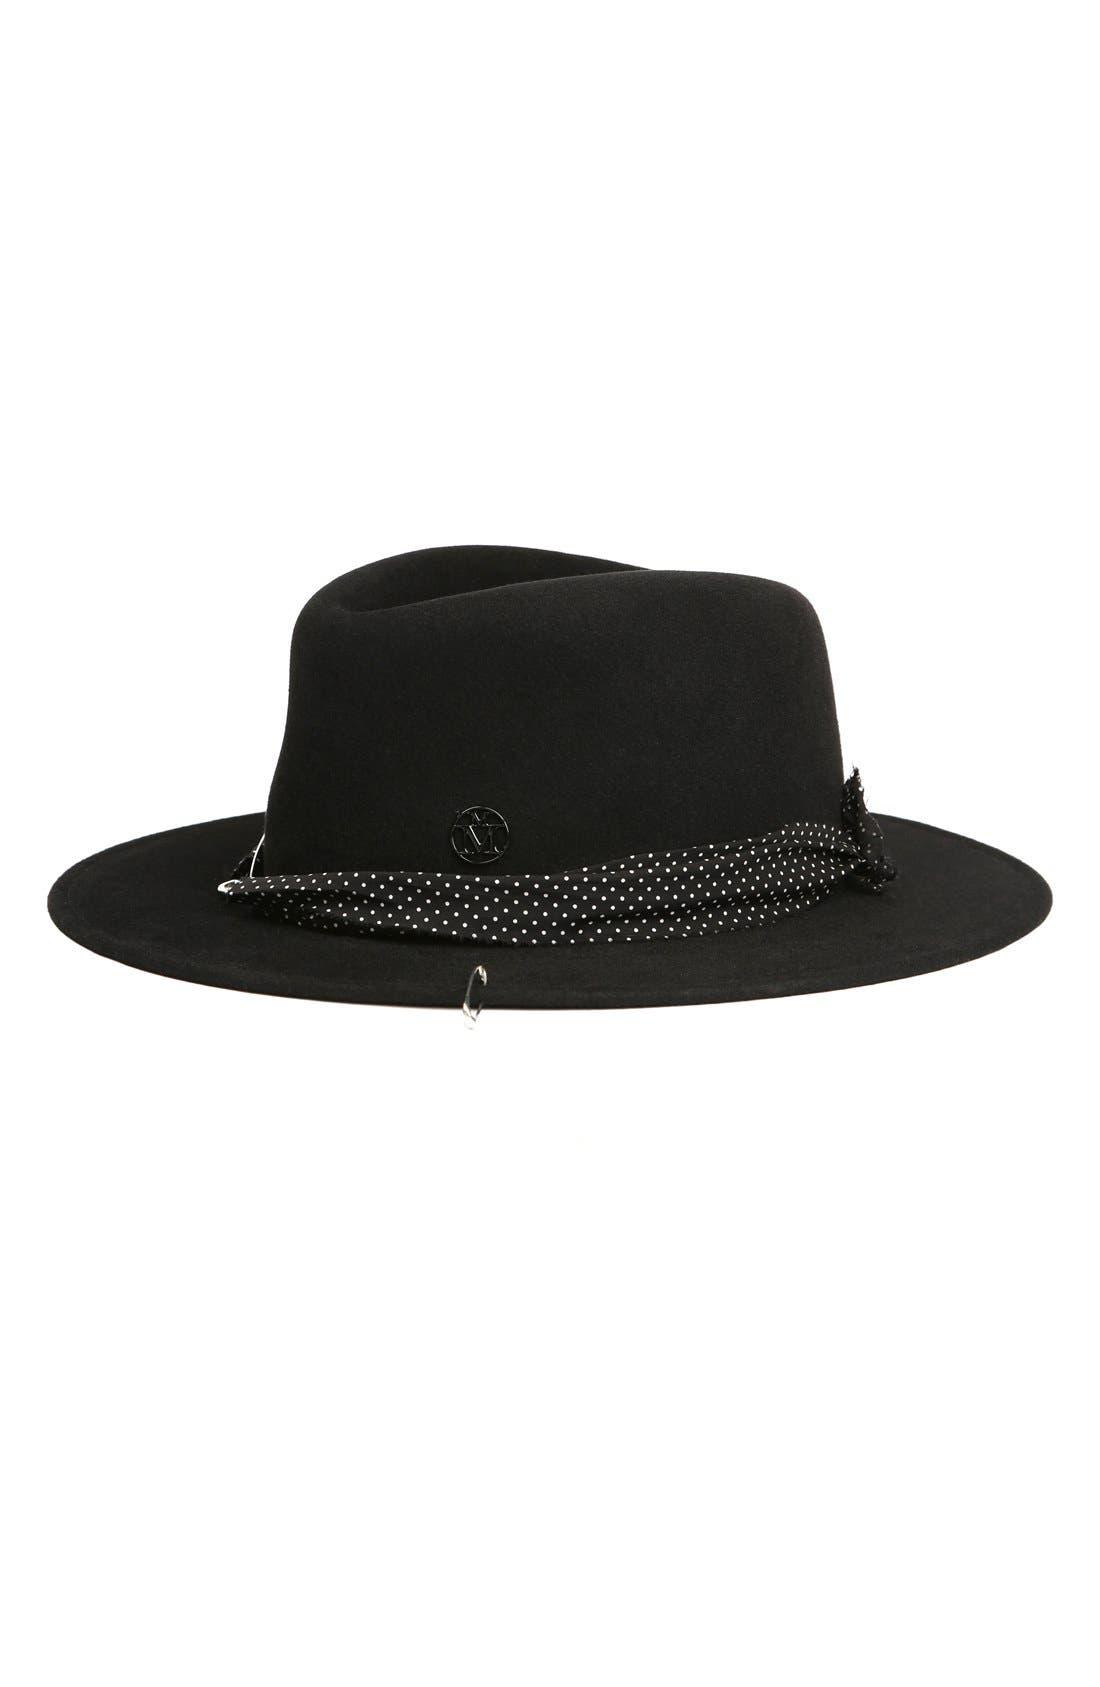 Maison Michel Thadee Fur Felt Hat